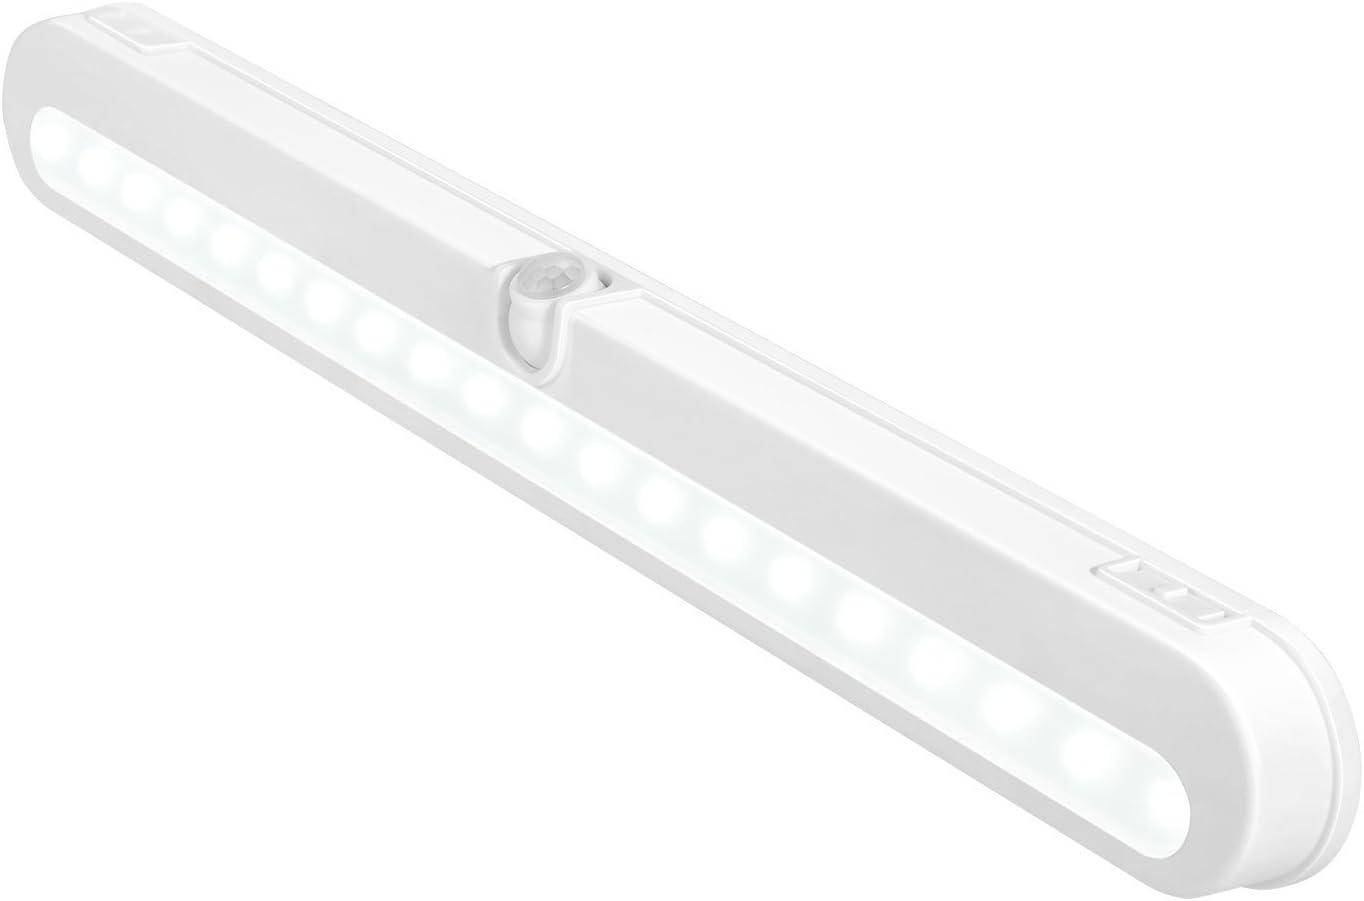 T01L LED Closet Light - BLS Super Bright 20 LED Under Cabinet Lighting Battery Powered/DC Input Wireless Motion Sensing Light, Auto On Off Switch, Motion Sensor & Light Sensor, Light Beam Adjustable